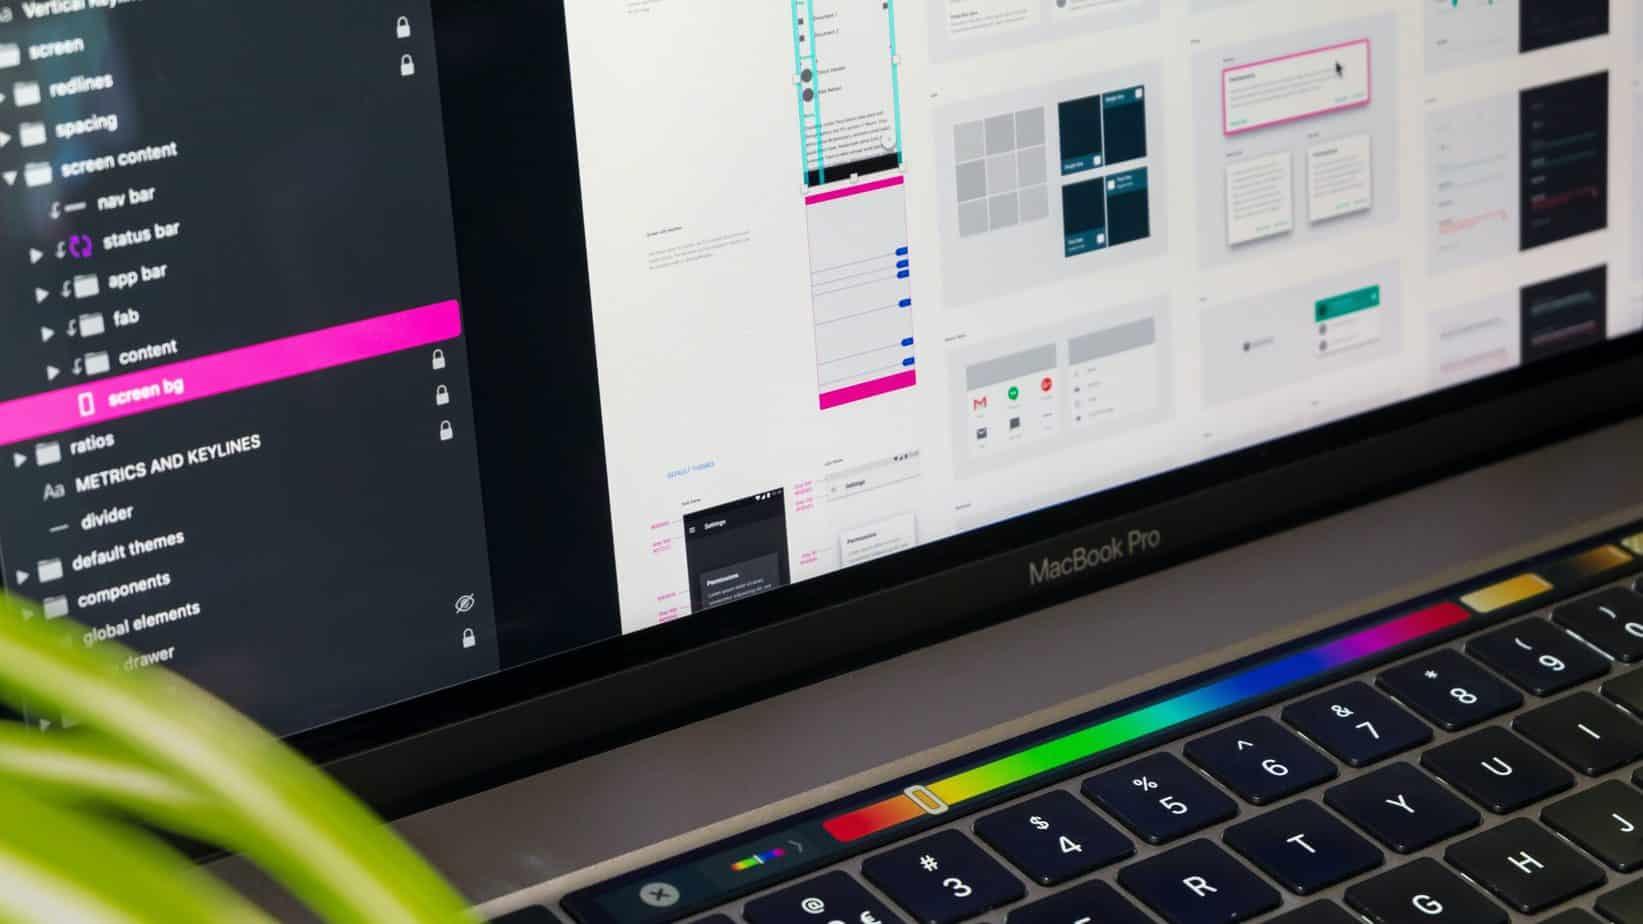 Screen of an UX Designer's Laptop.